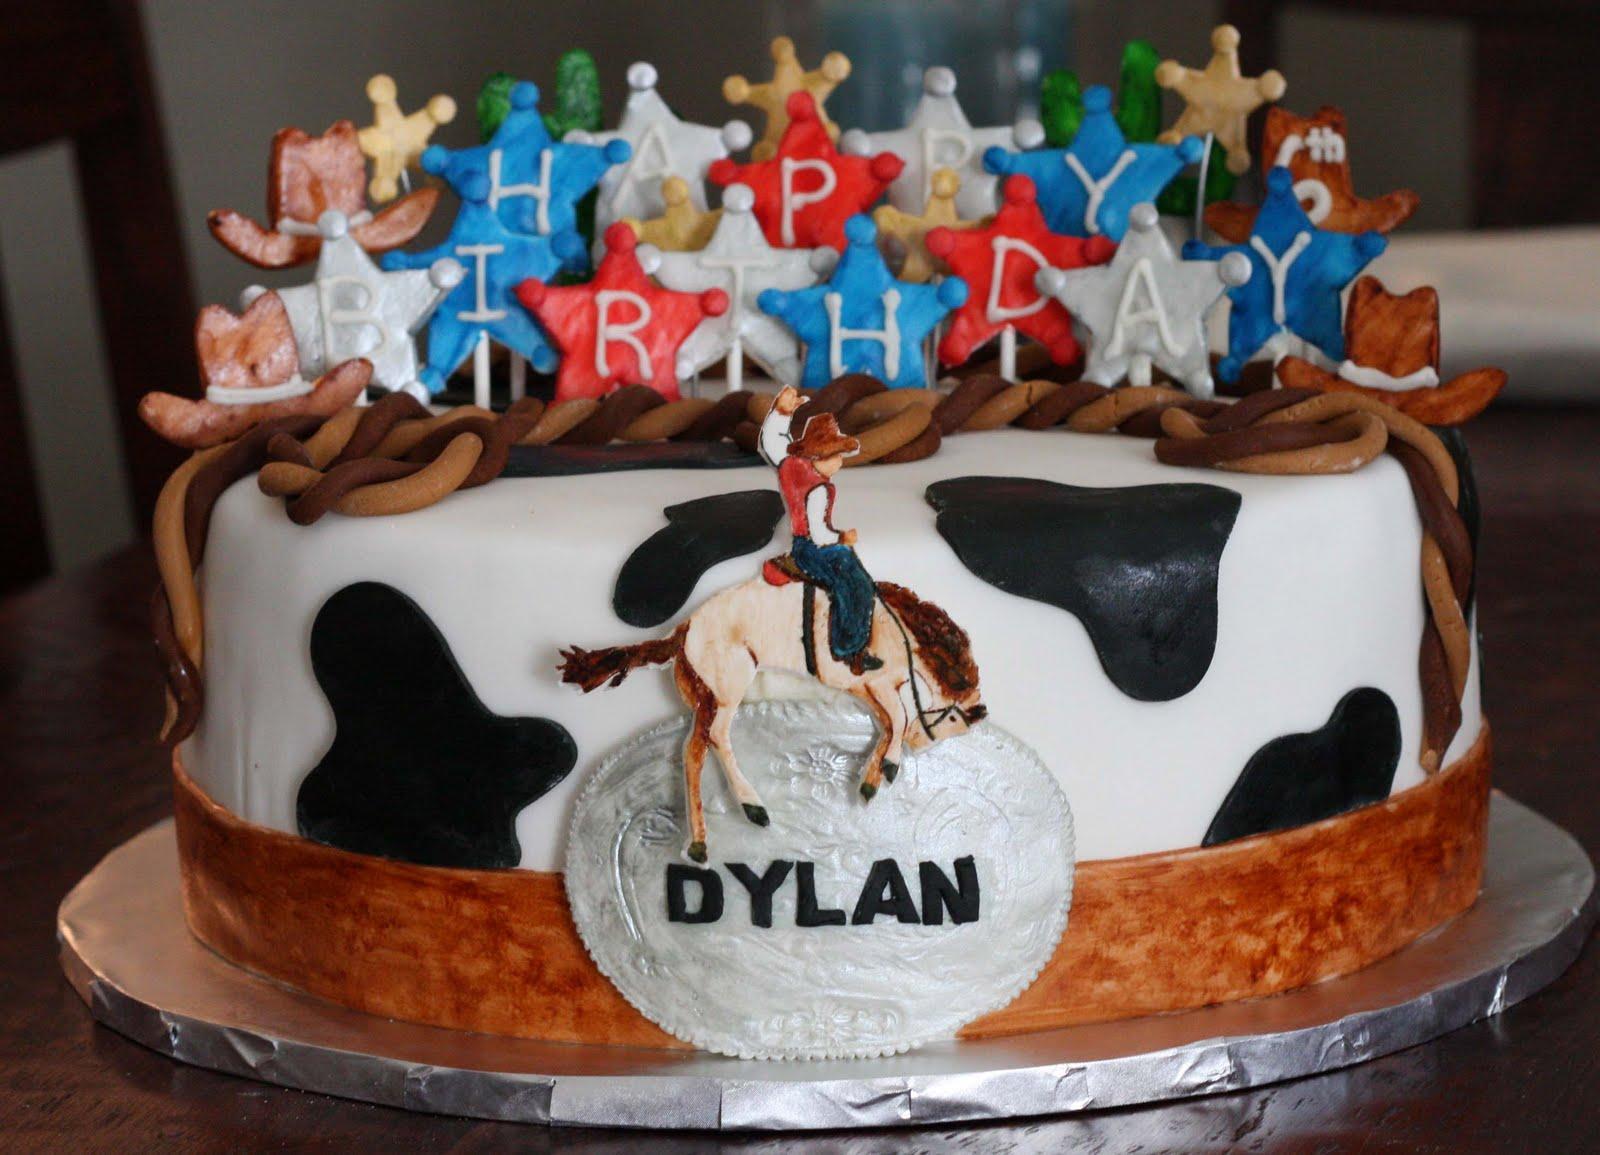 Swell Cowboy Cakes Decoration Ideas Little Birthday Cakes Funny Birthday Cards Online Alyptdamsfinfo